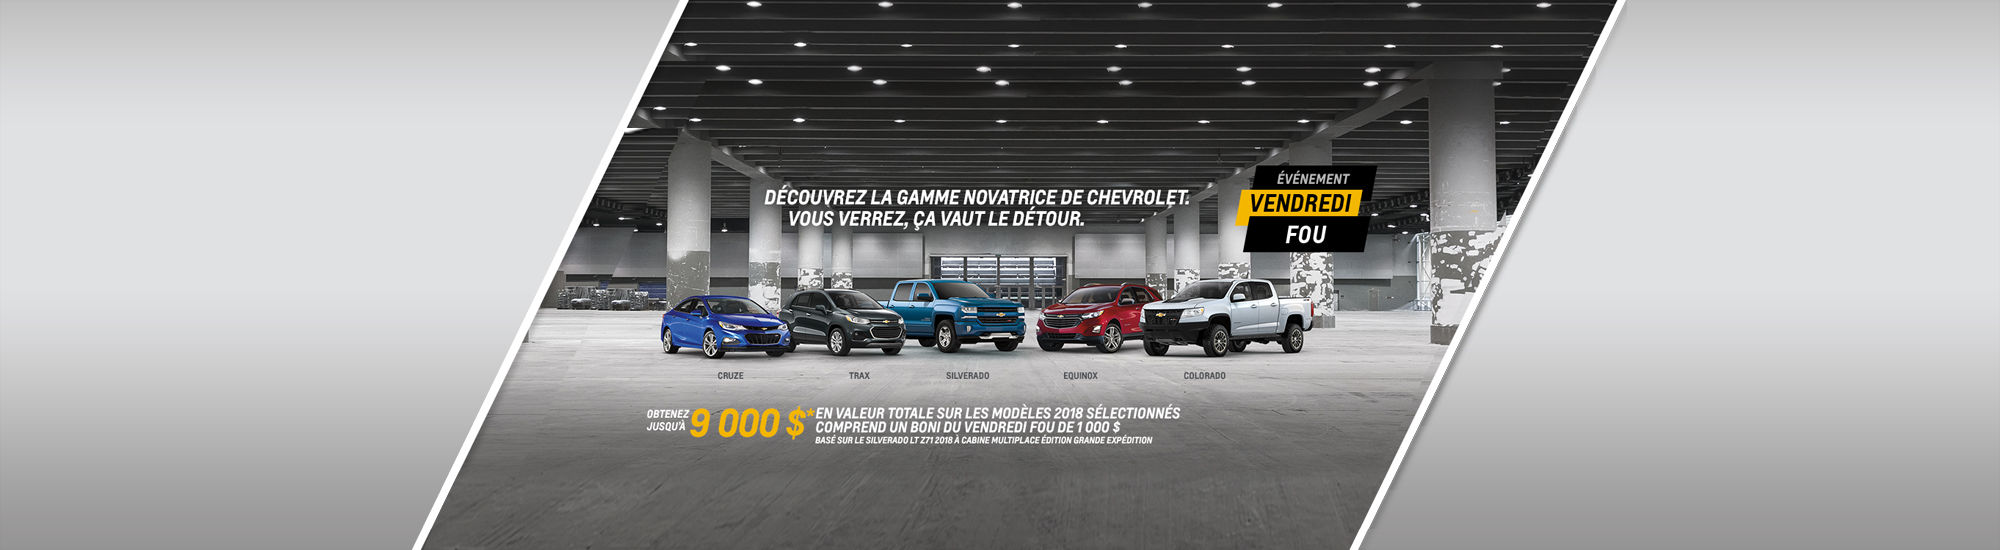 Événement Chevrolet